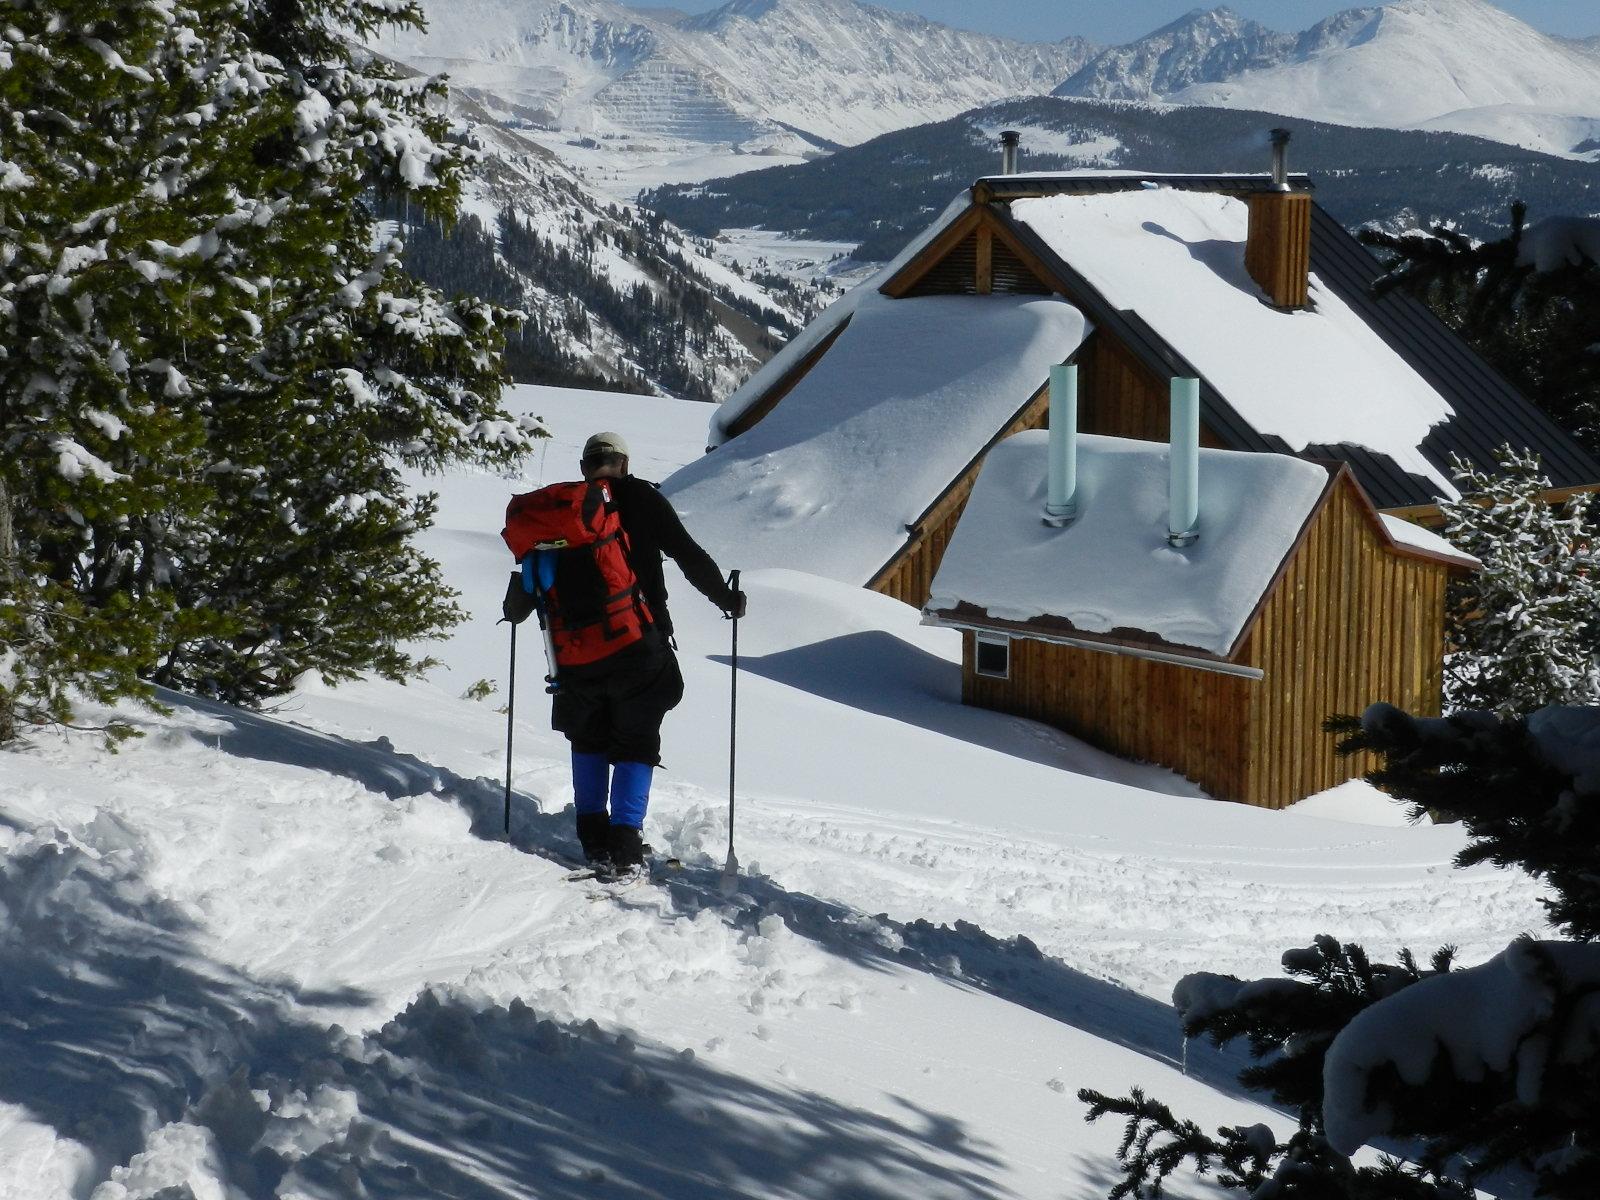 Approaching the Jackal Hut